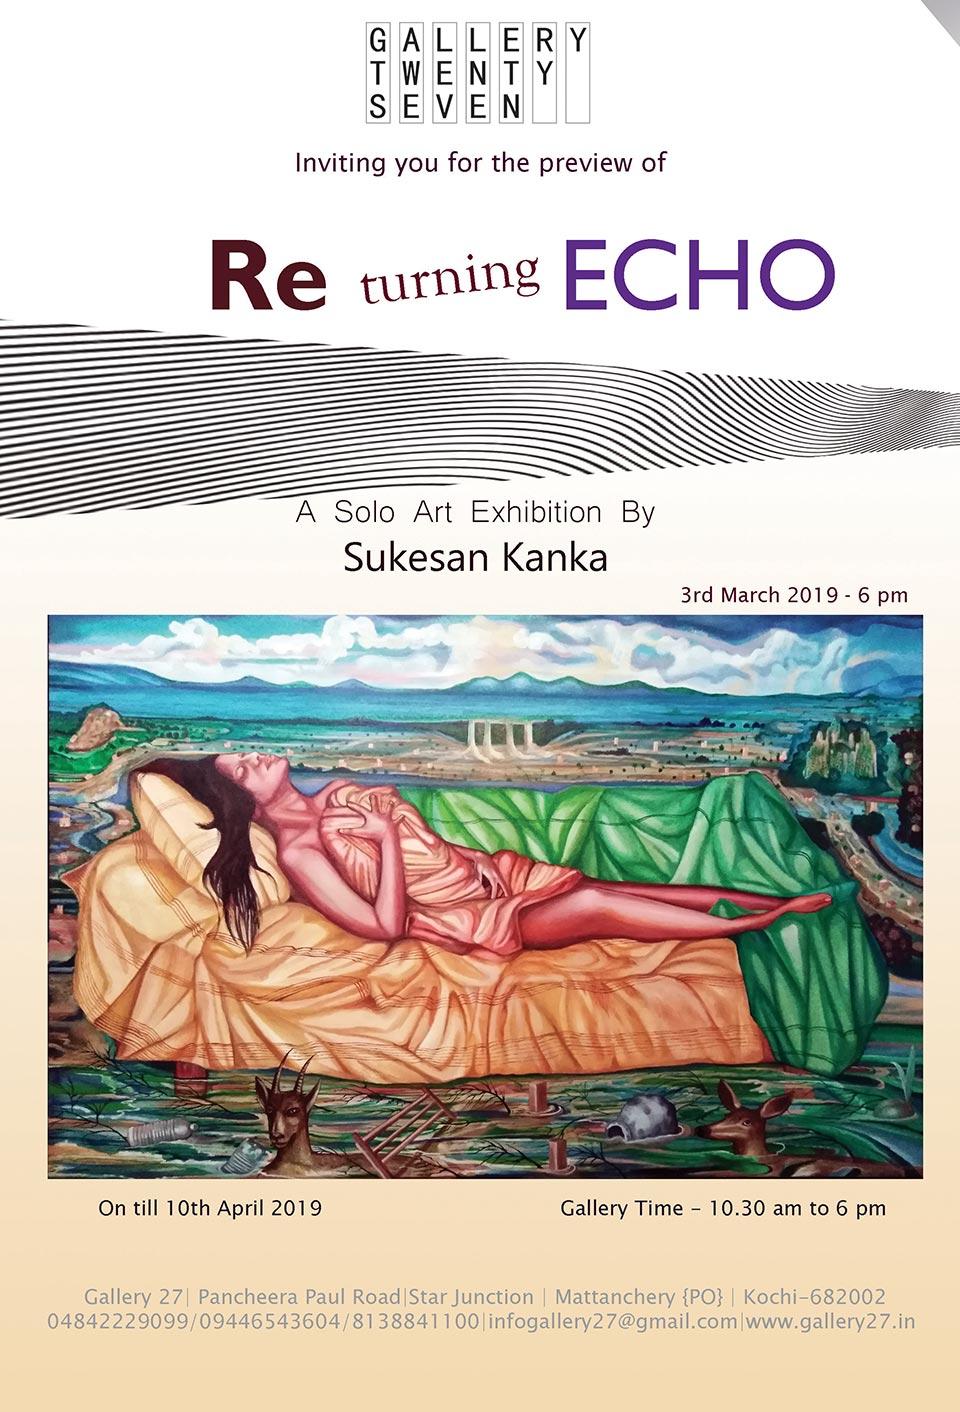 Re turning ECHO